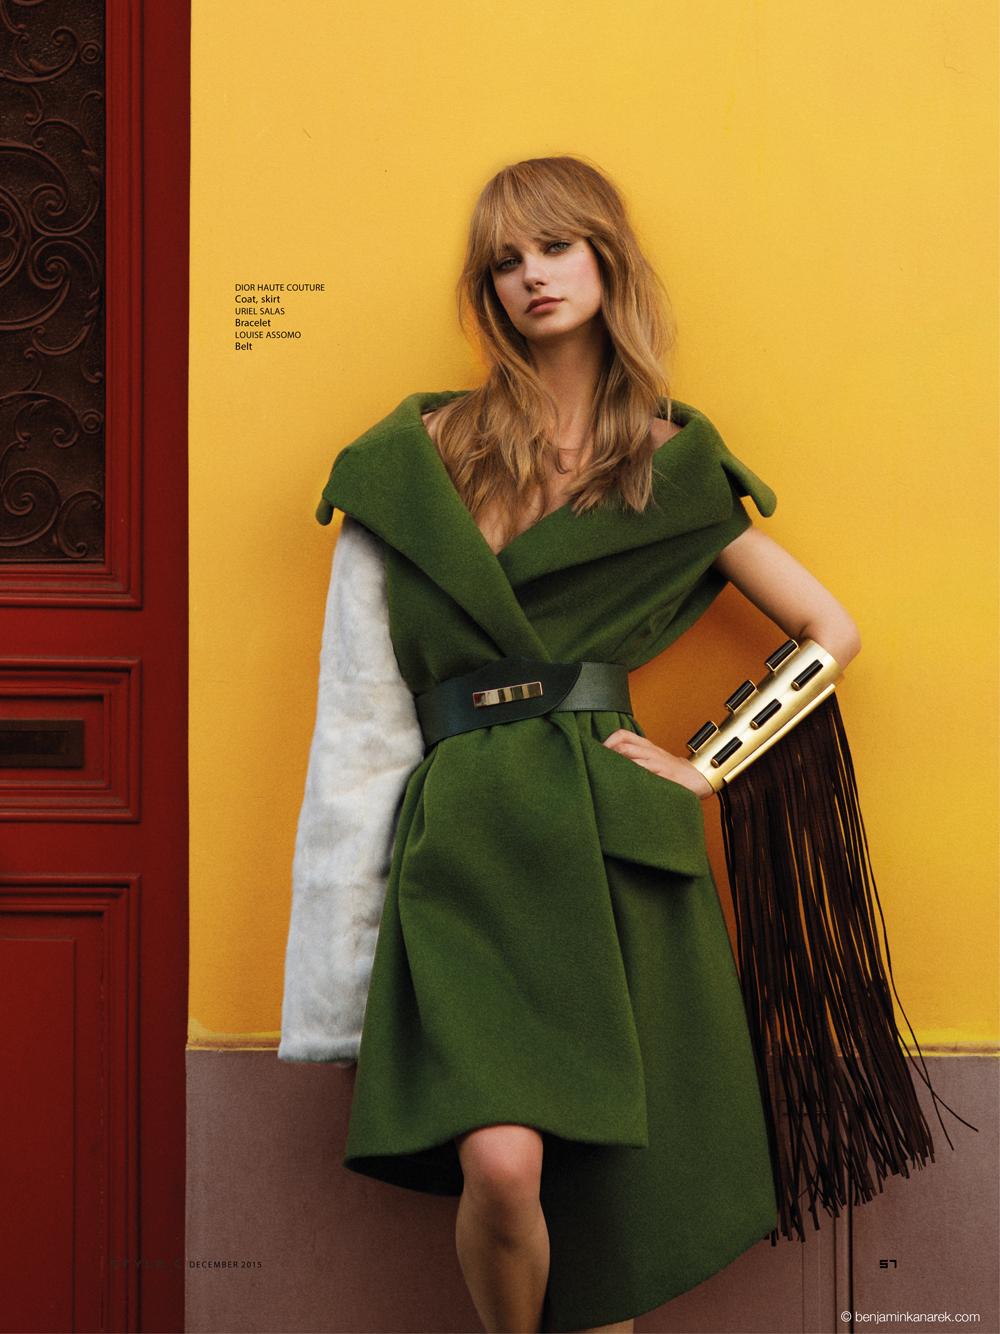 Alexandra Tikerpuu in Christian Dior © Benjamin Kanarek